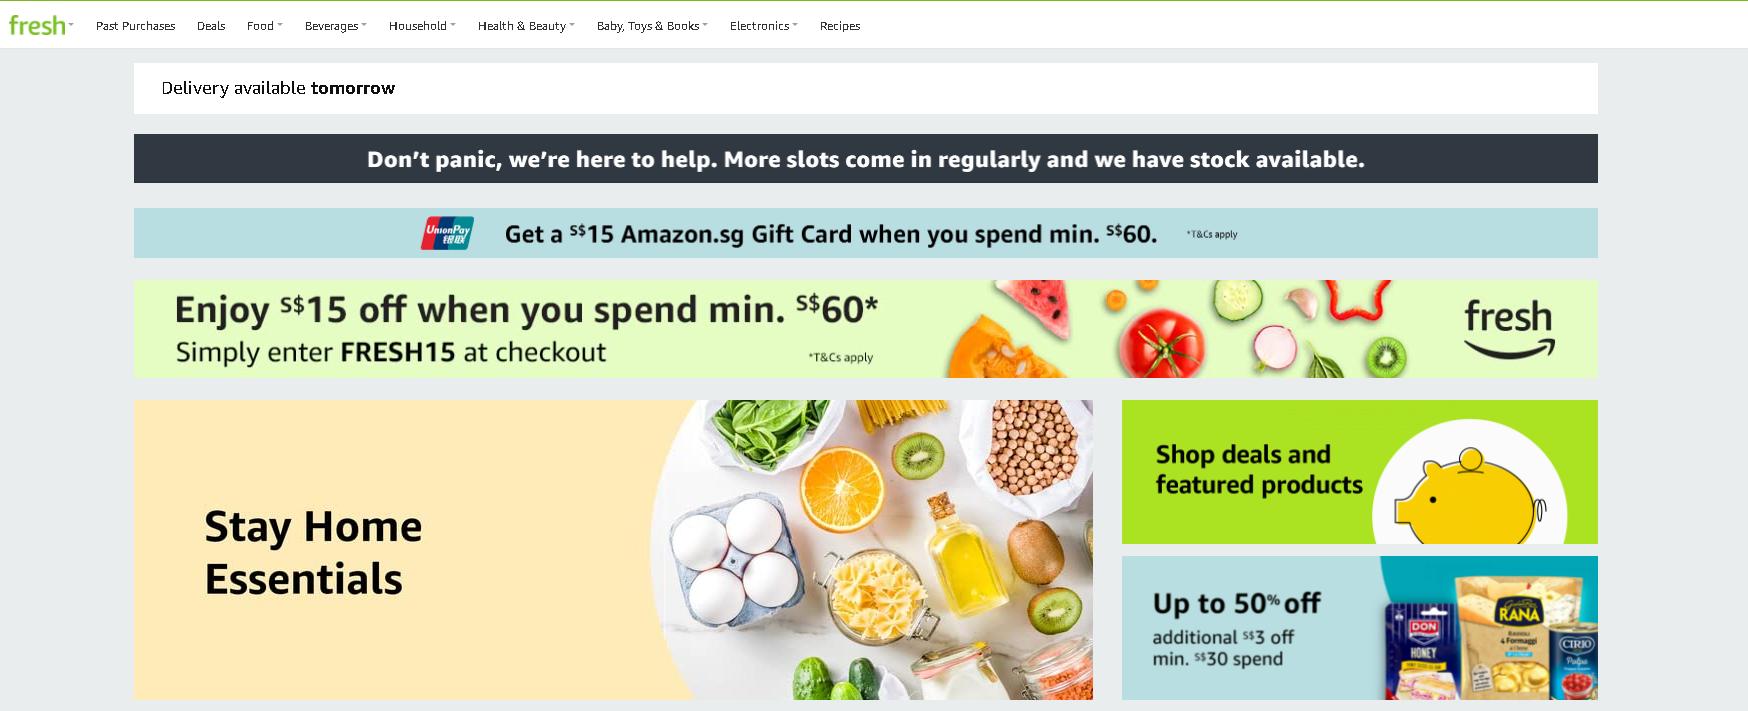 Amazon Fresh Online Grocery Store